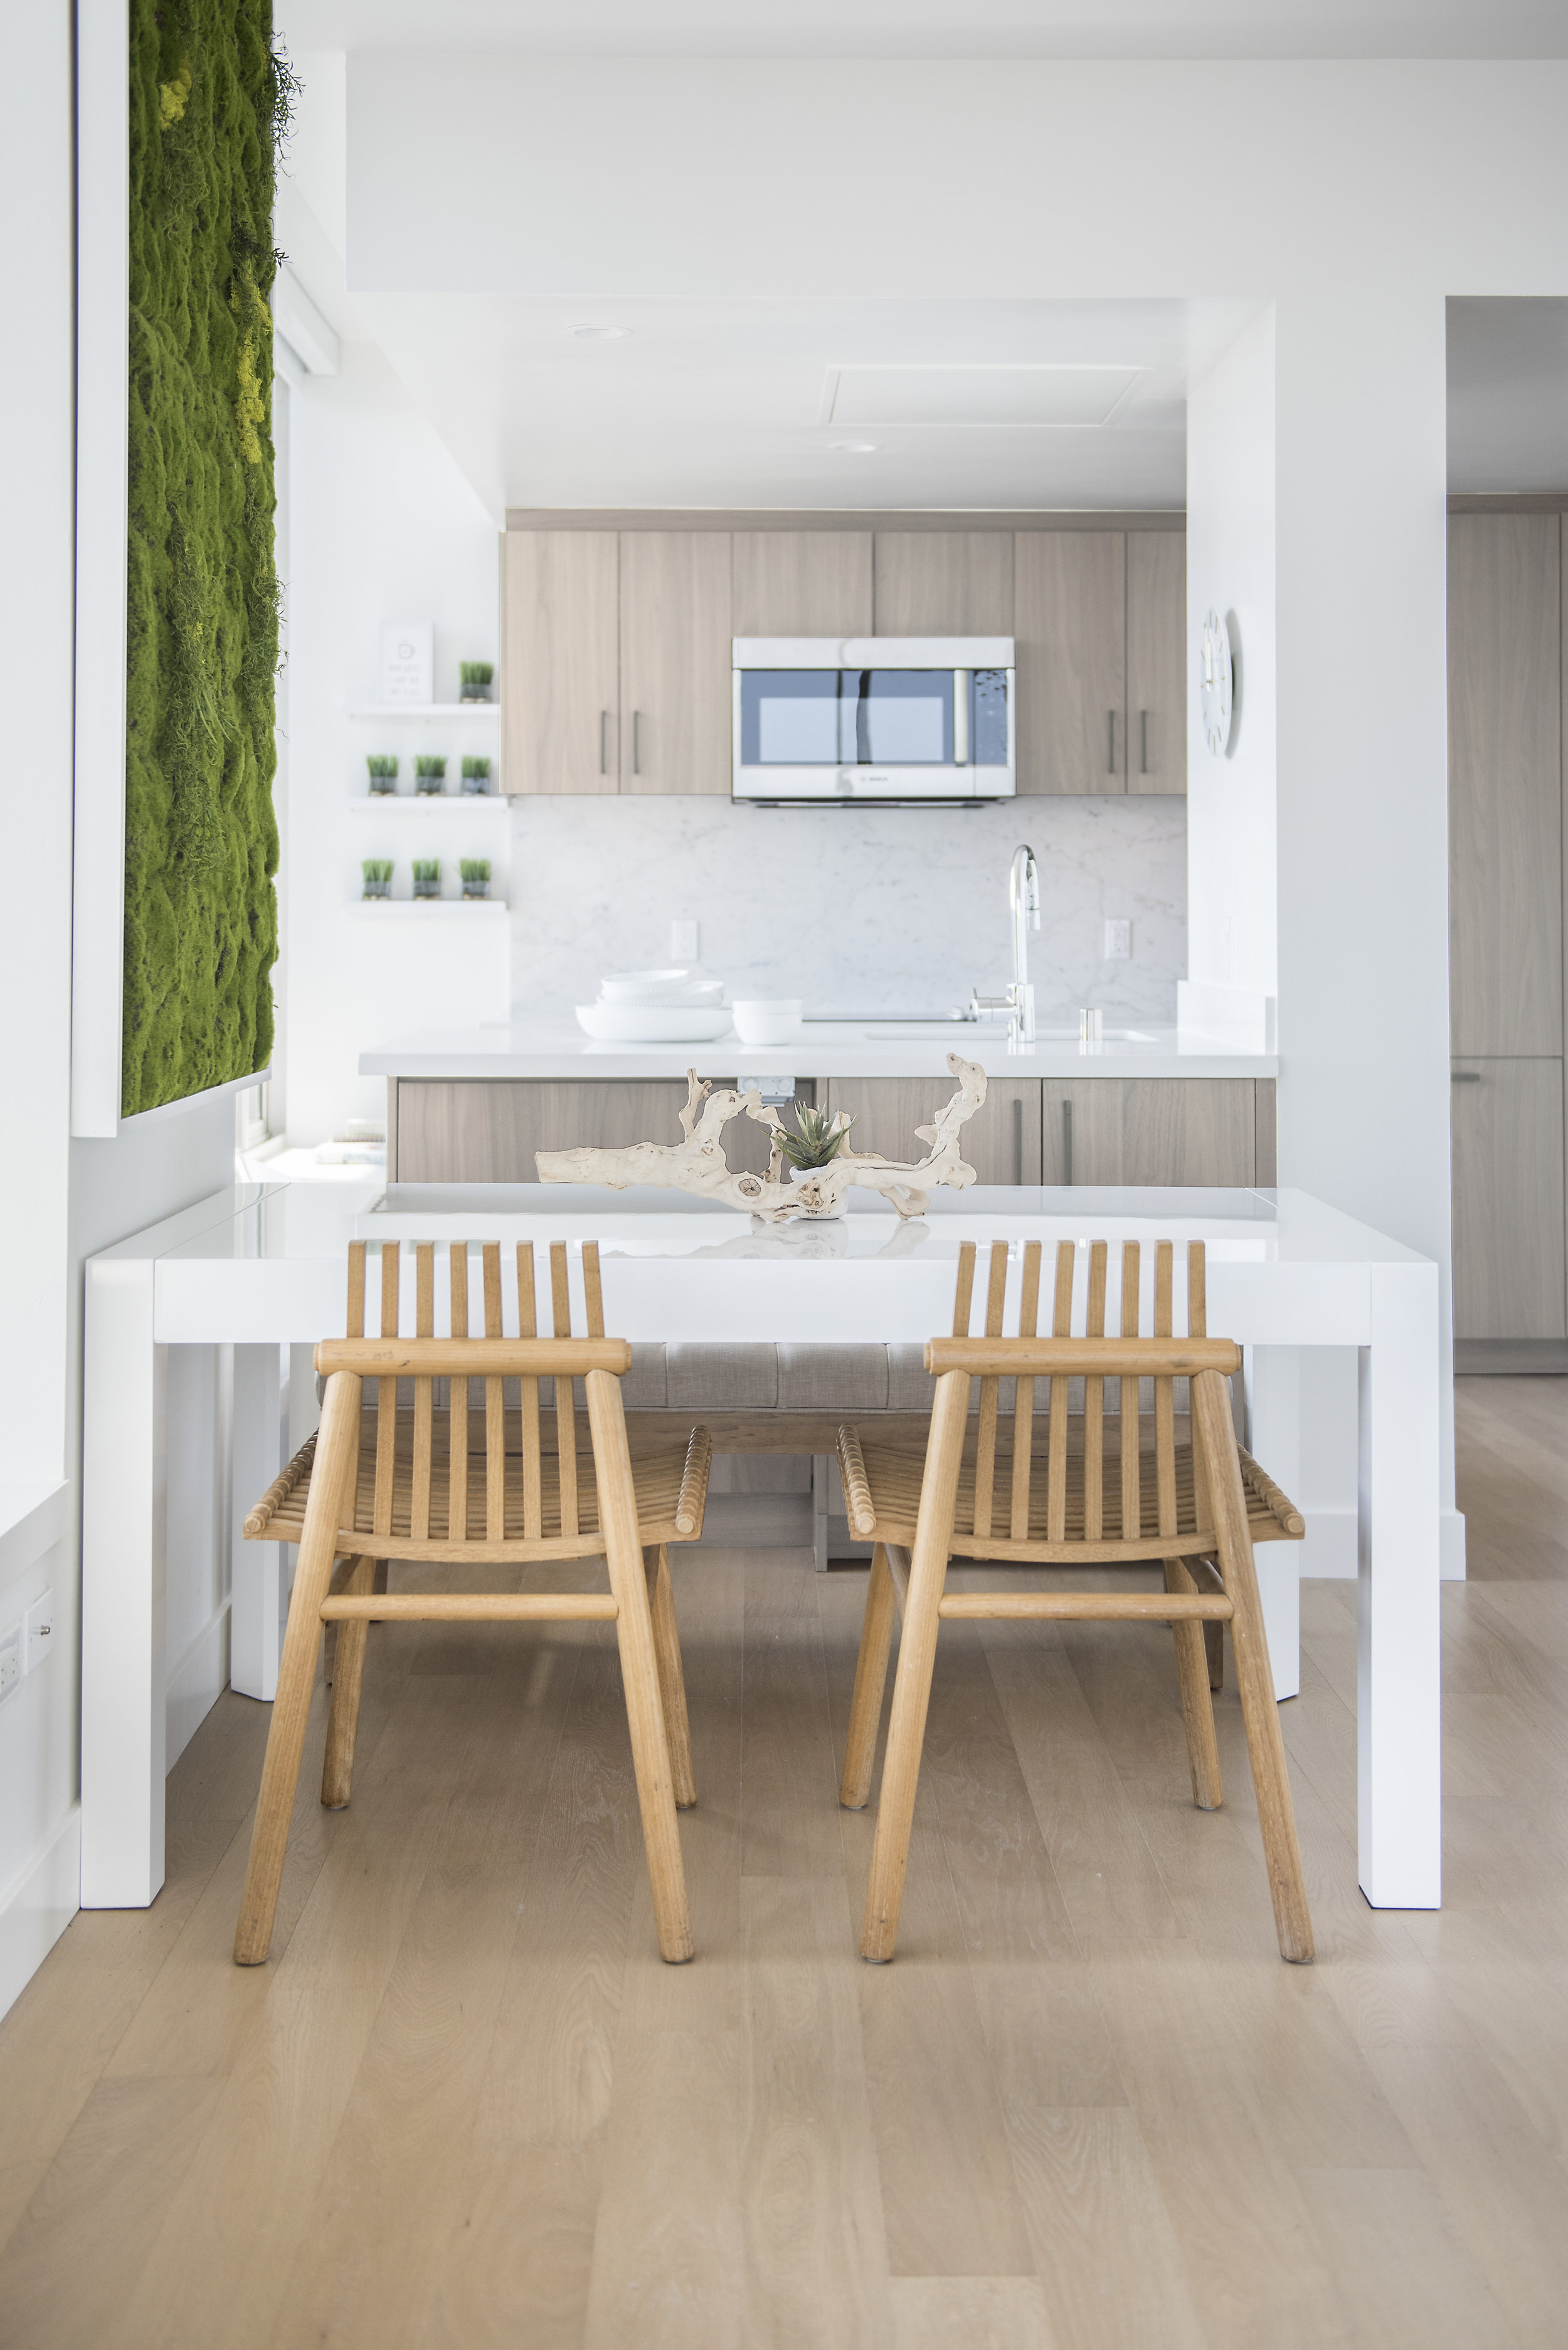 JuliaSperling_Houzz_San Francisco_Apartment_10.jpg